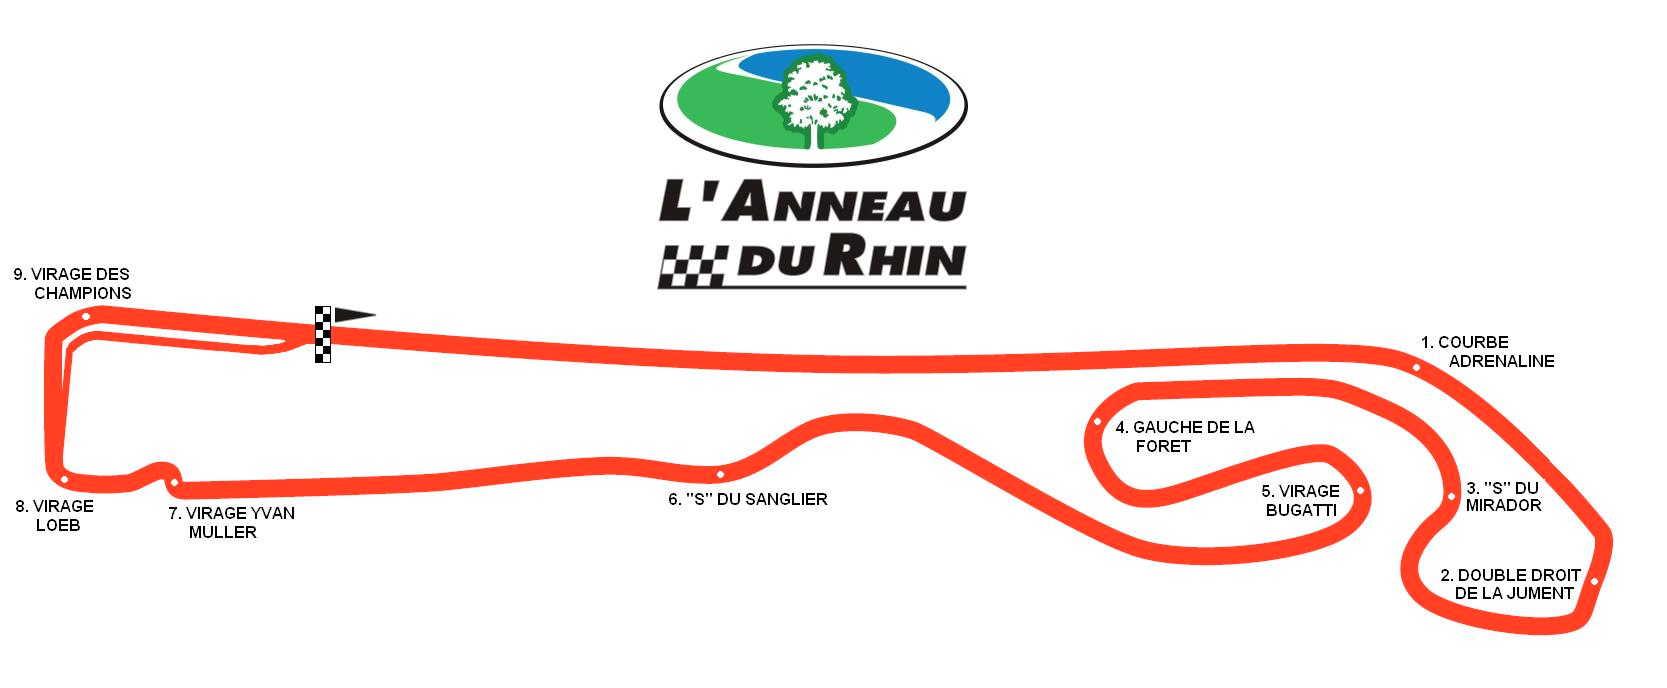 Anneau du Rhin - Juli 2020